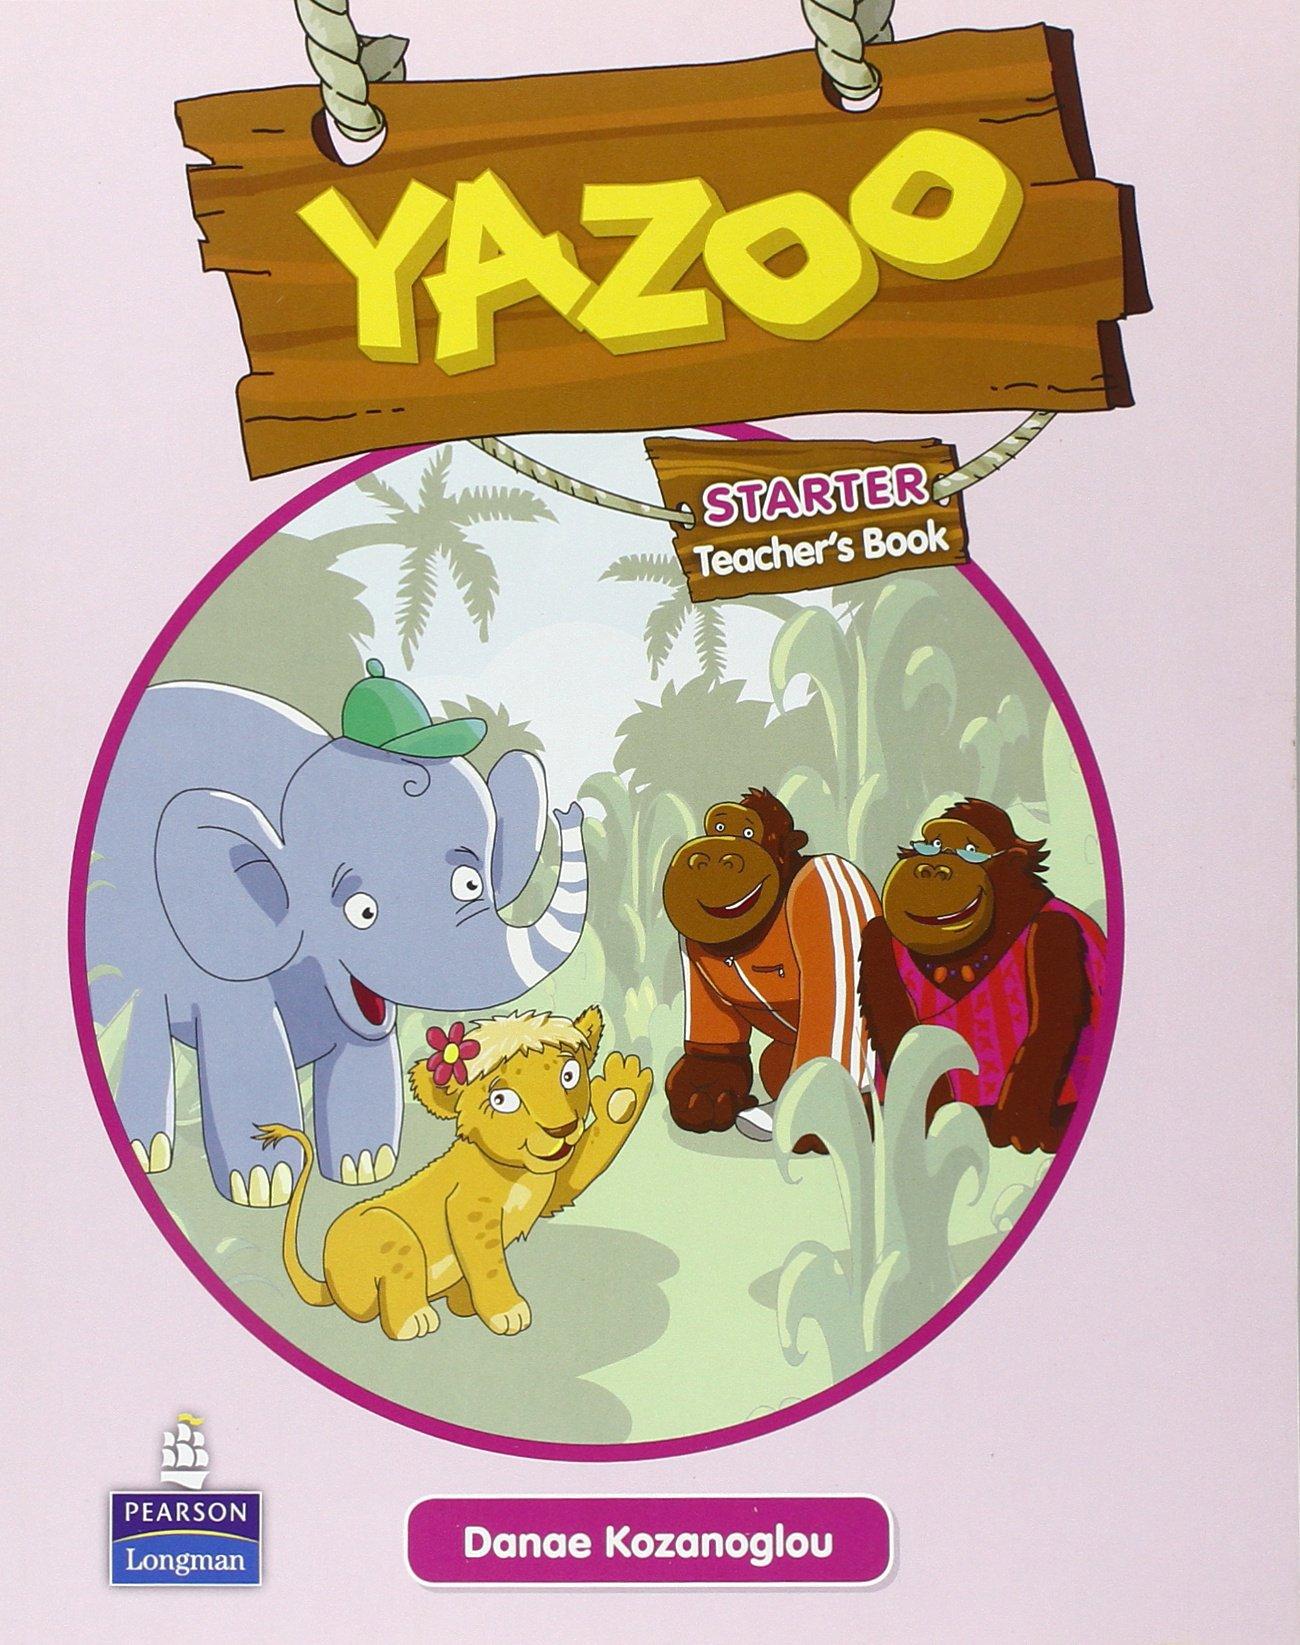 Yazoo Global Starter Teacher's Guide: Yazoo Global Starter Teacher's Guide Starter pdf epub